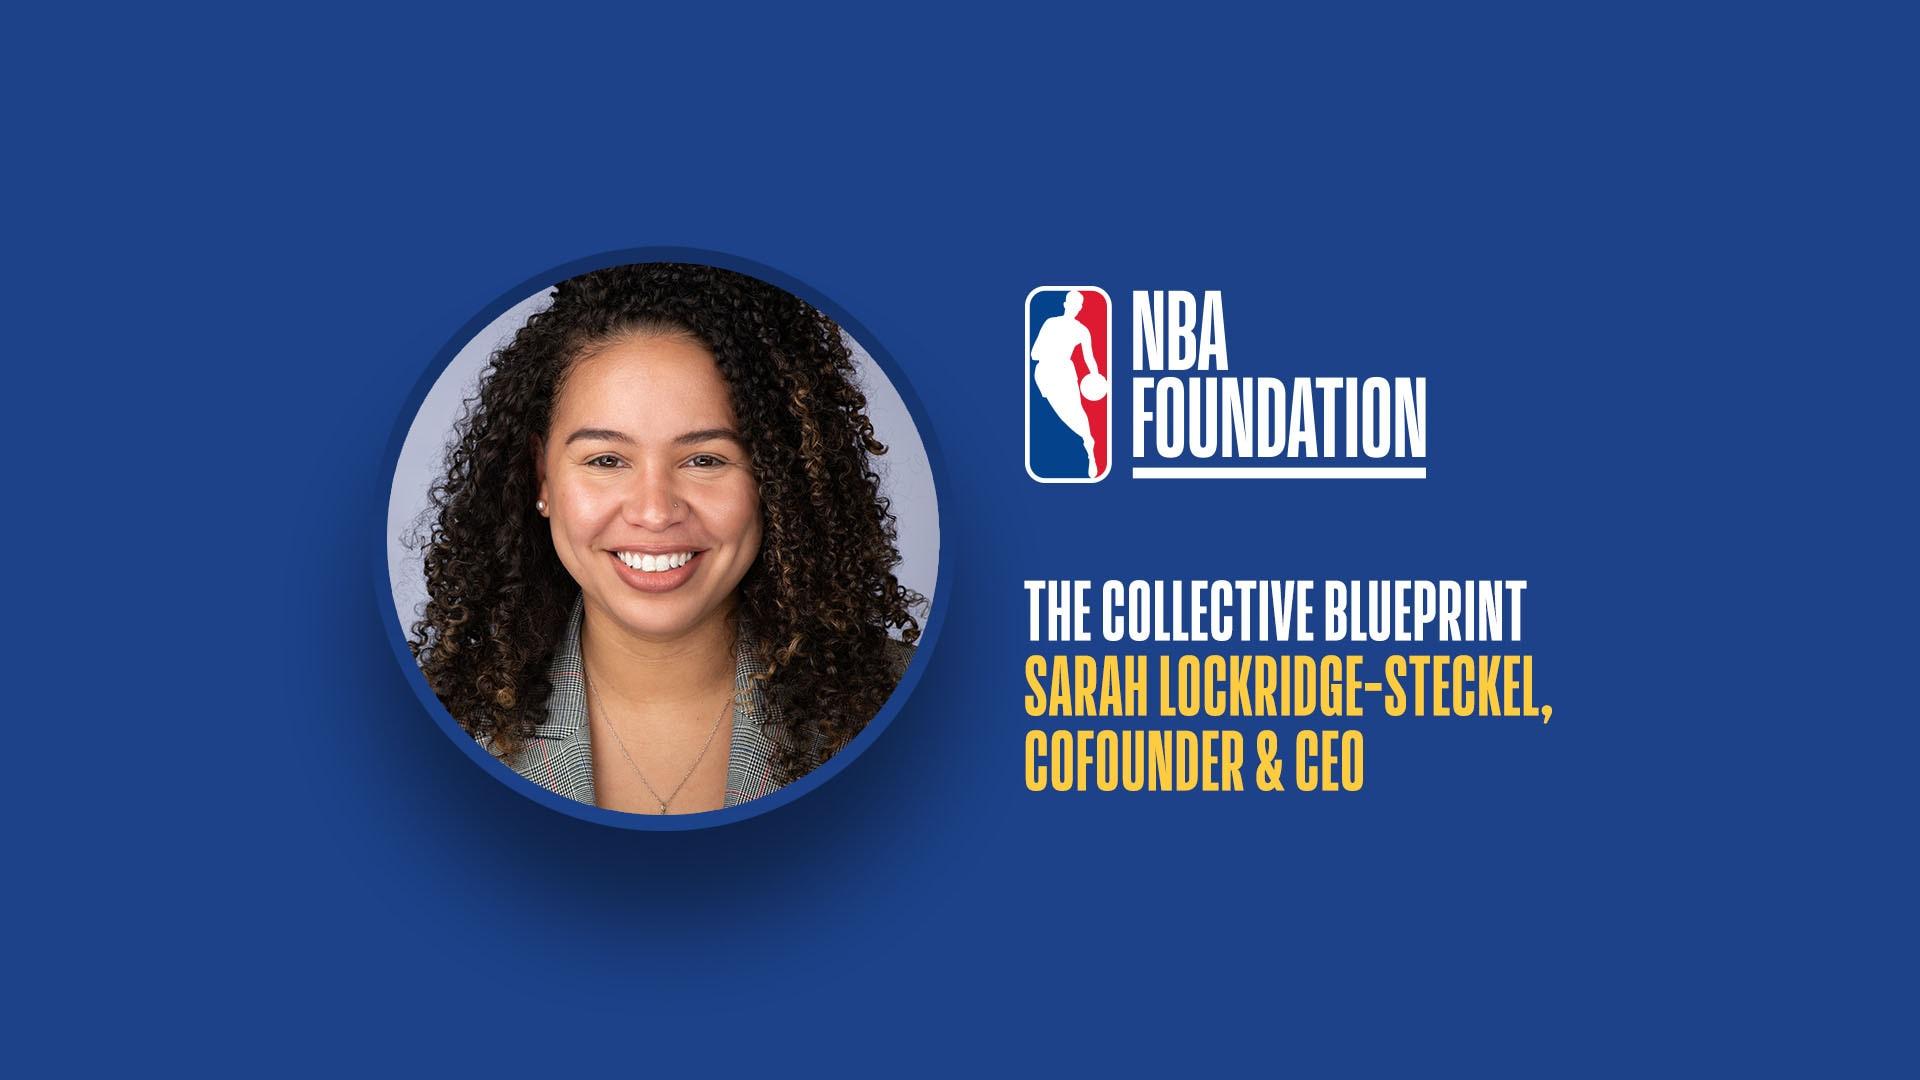 NBA Foundation grantee spotlight: The Collective Blueprint